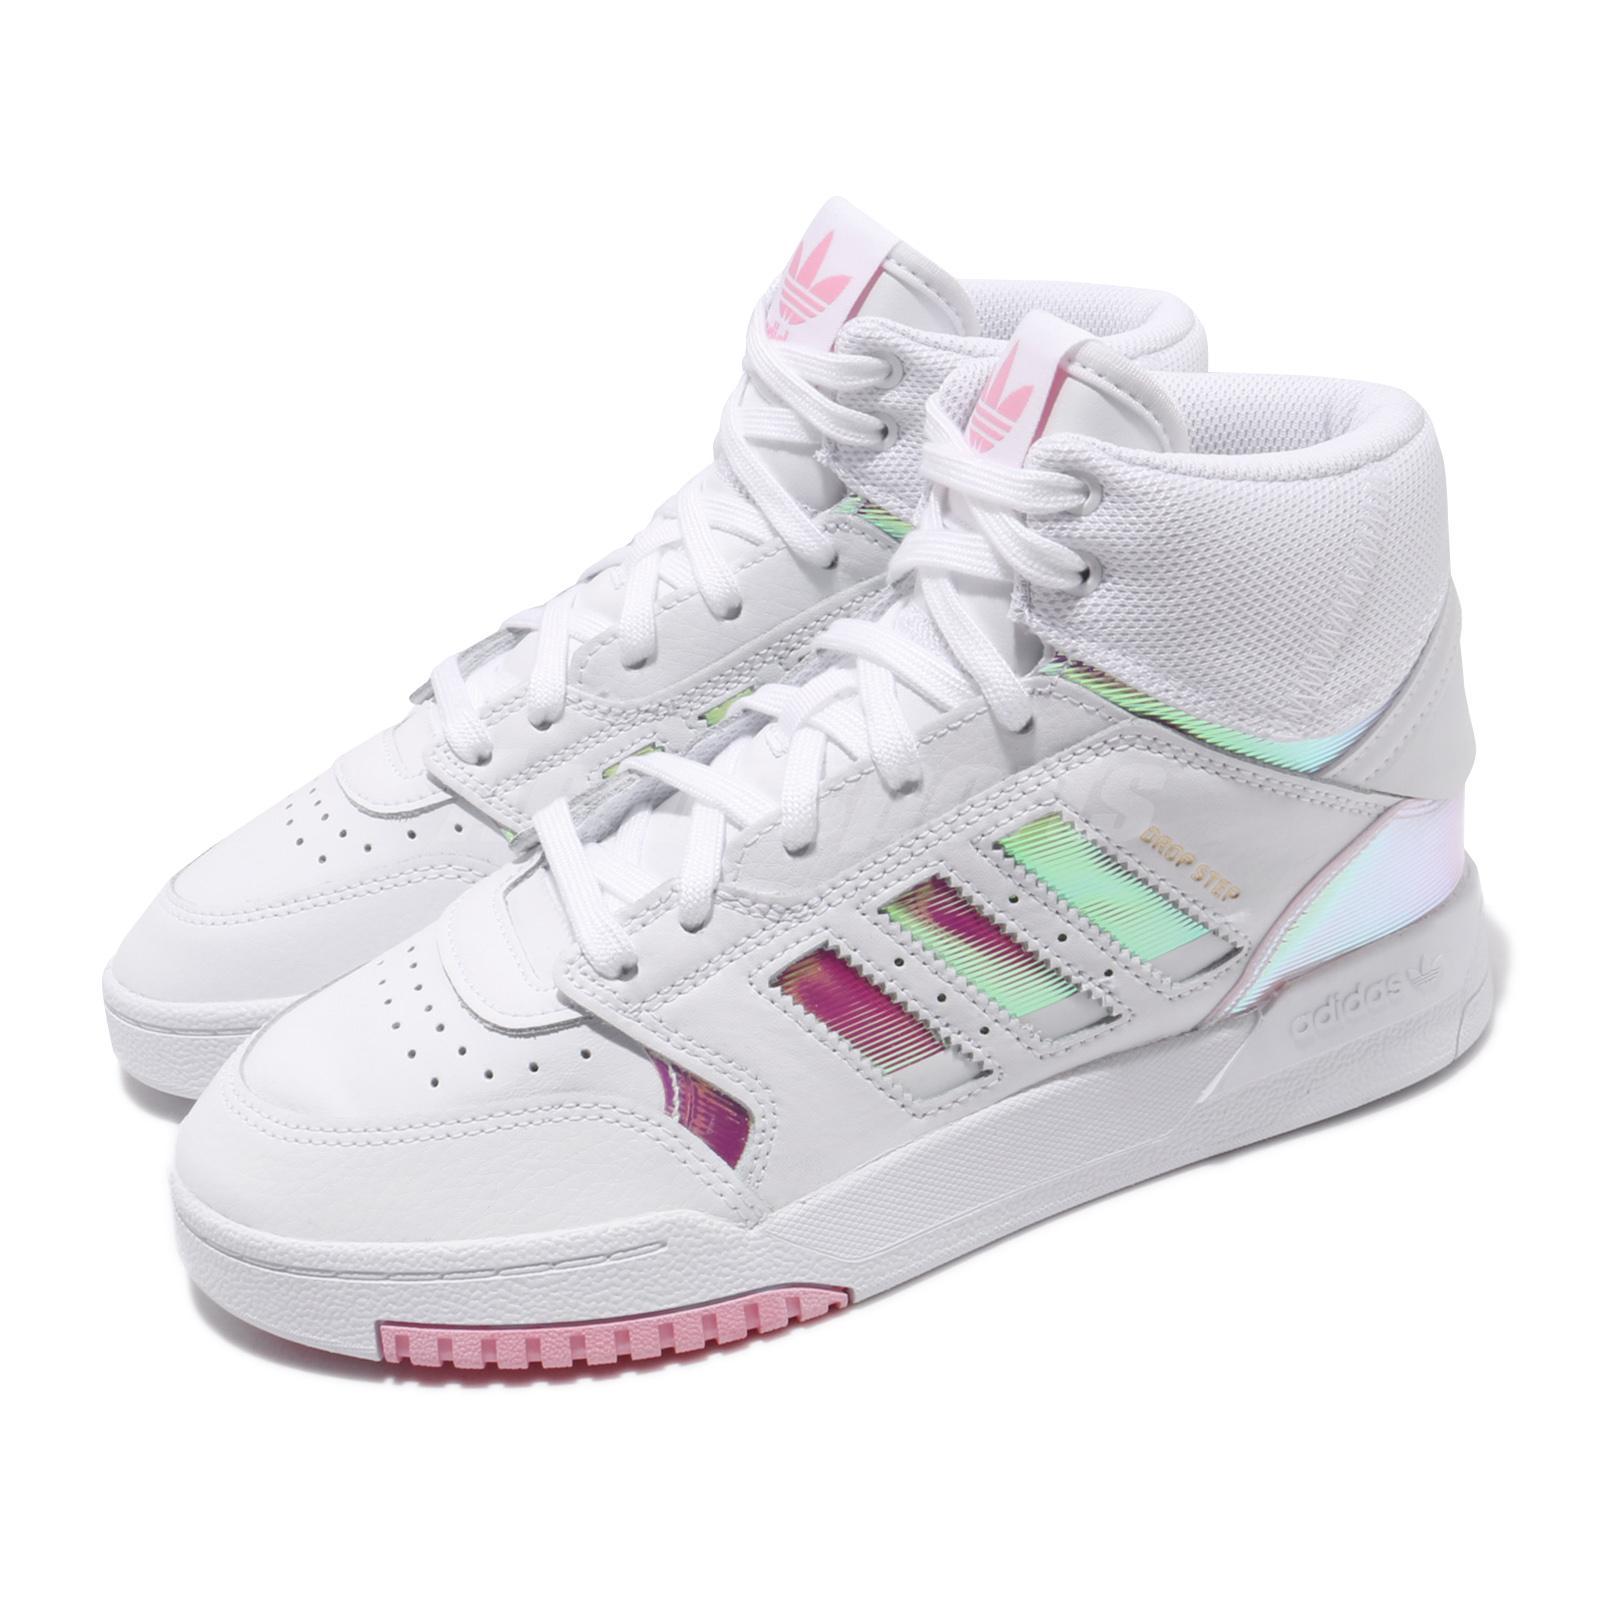 adidas superstar ii (womens) - white/light pink